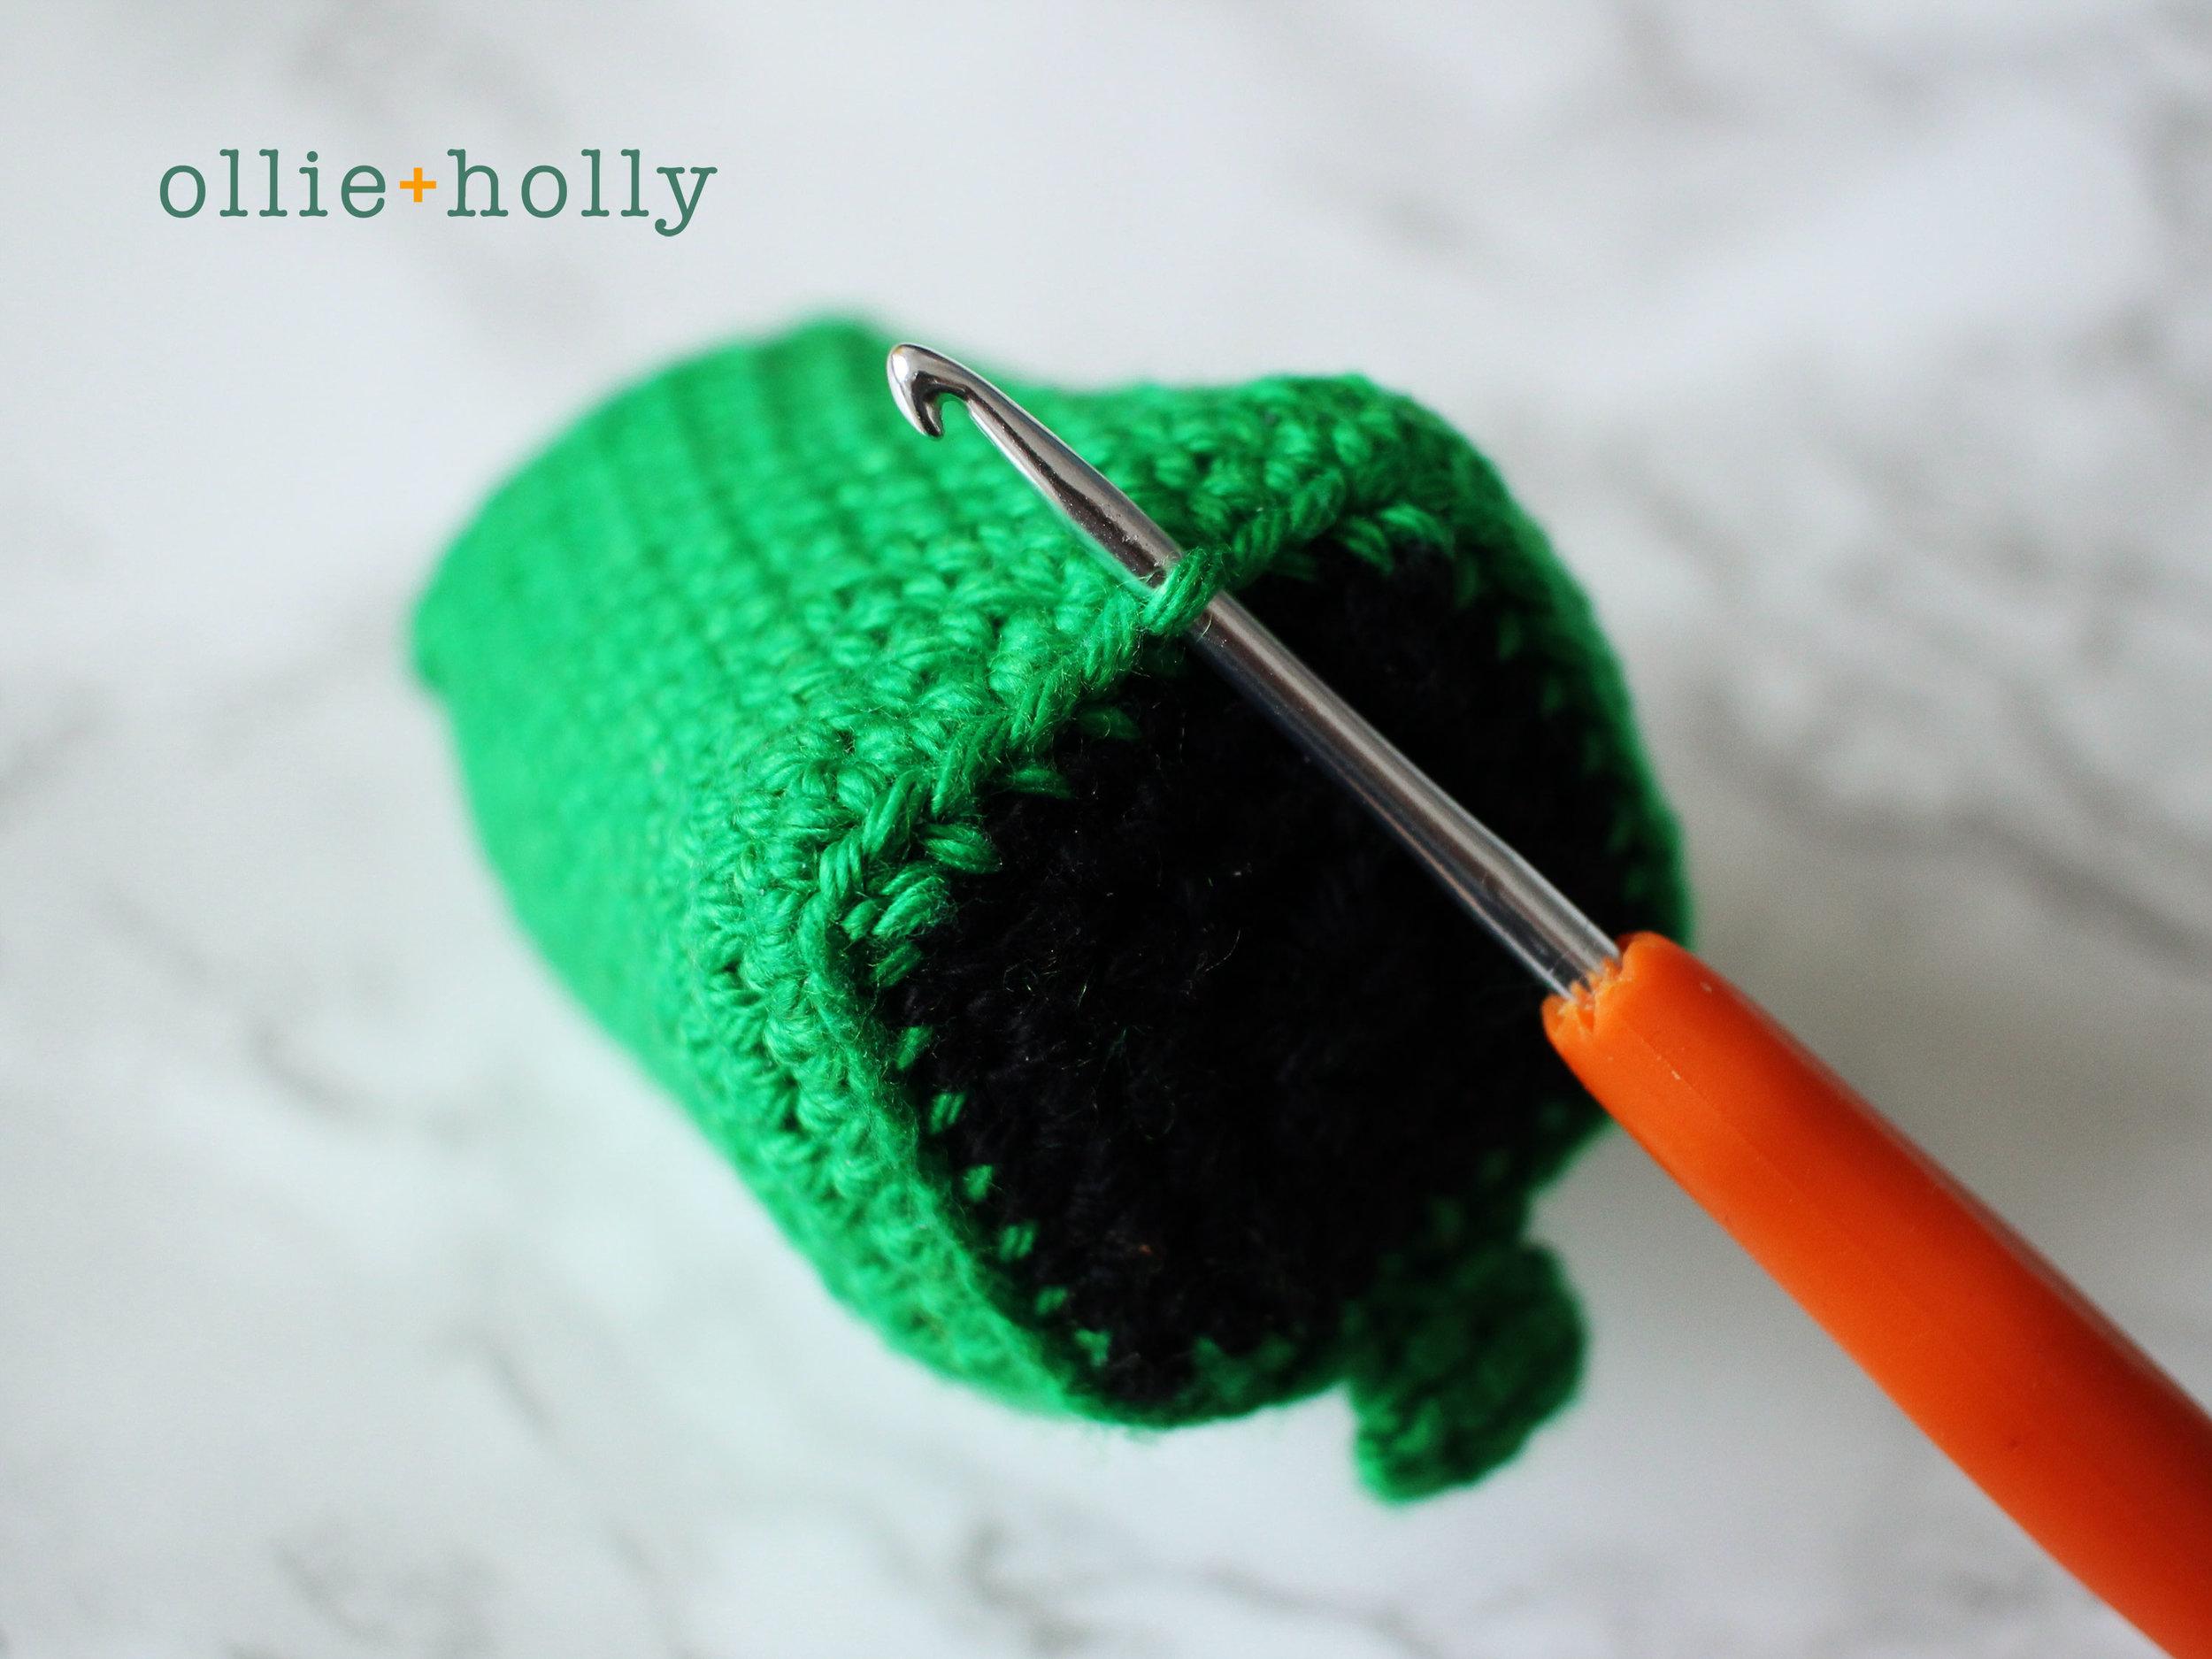 Toronto Green Bin Amigurumi Crochet Pattern Step 1